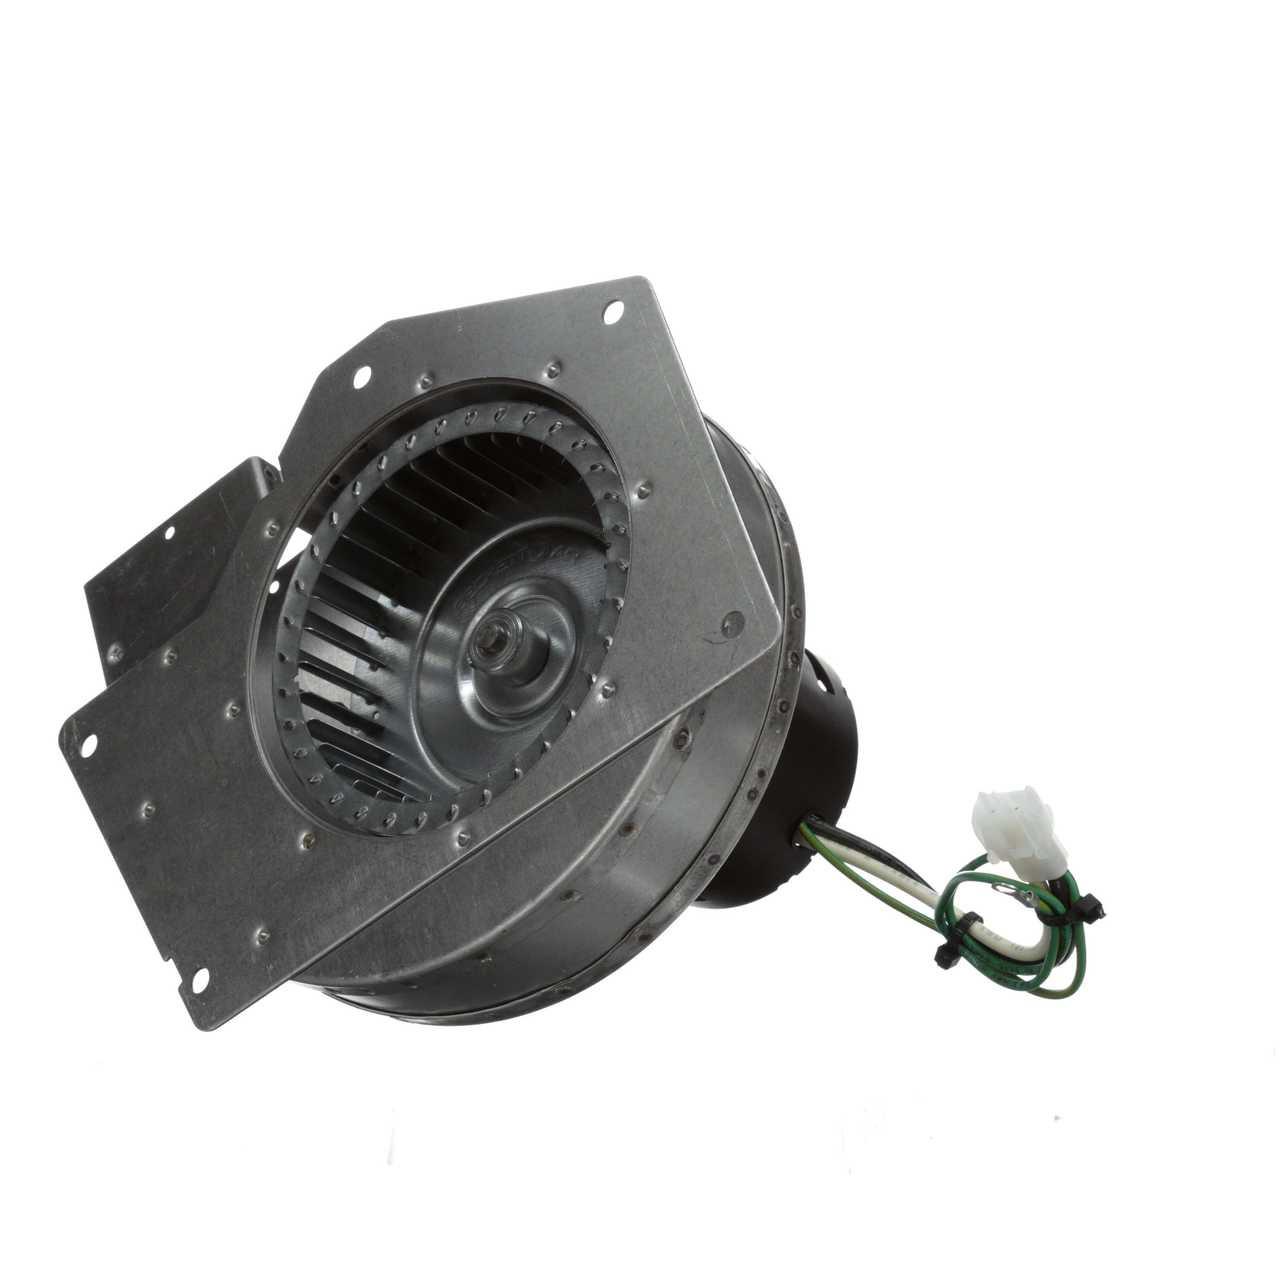 Trane Furnace Draft Inducer Blower Jakel J238 138 1344 115v Fasco A143